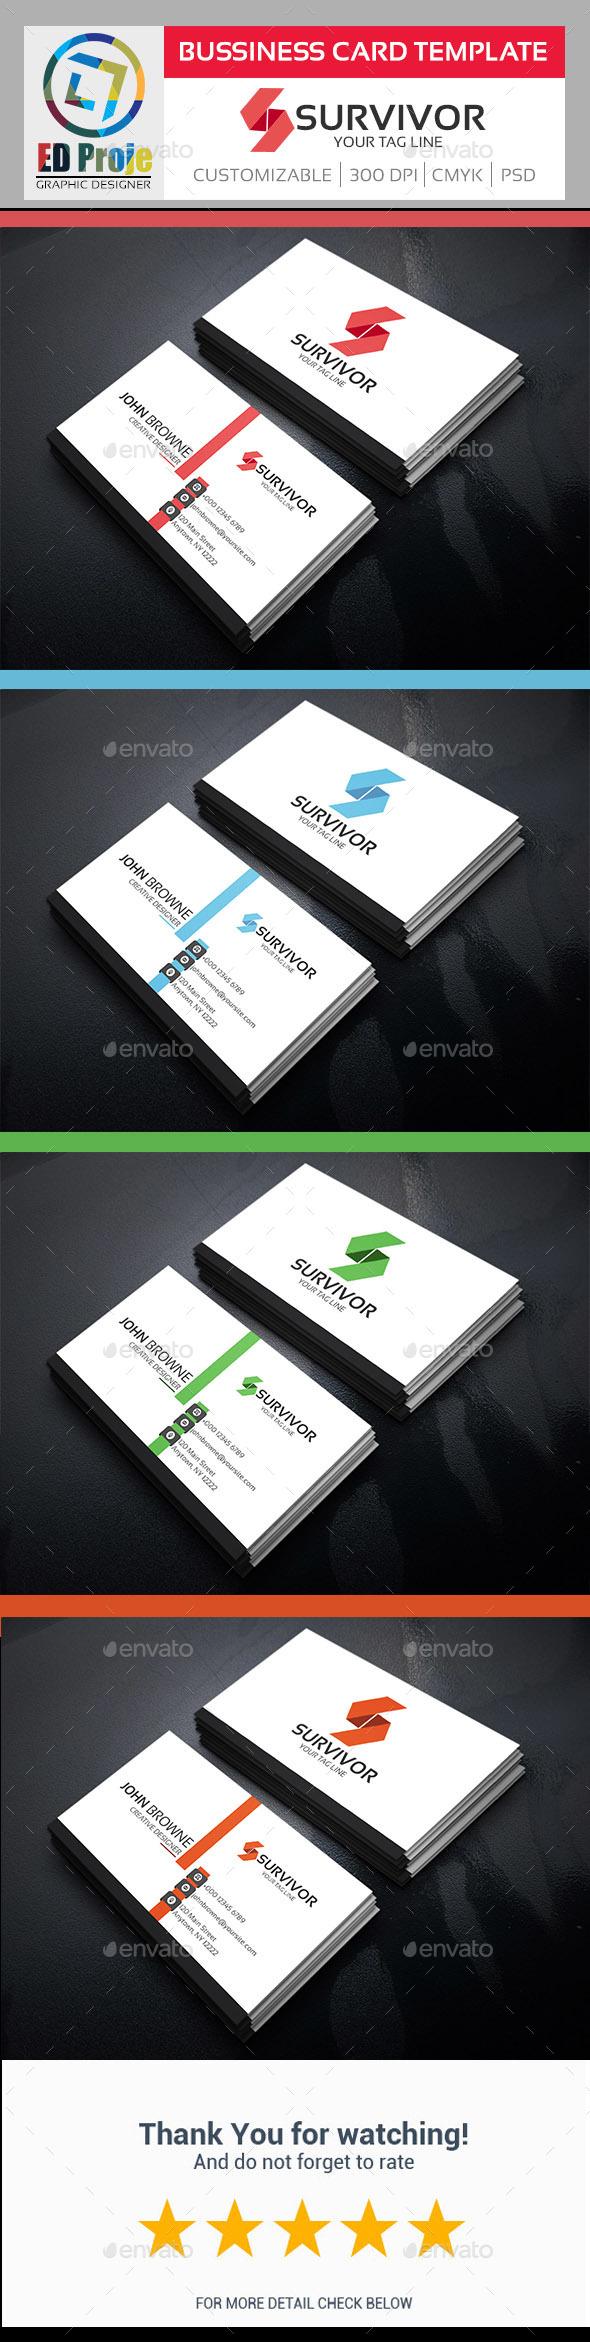 Survivor Business Card - Business Card Template - Corporate Business Cards